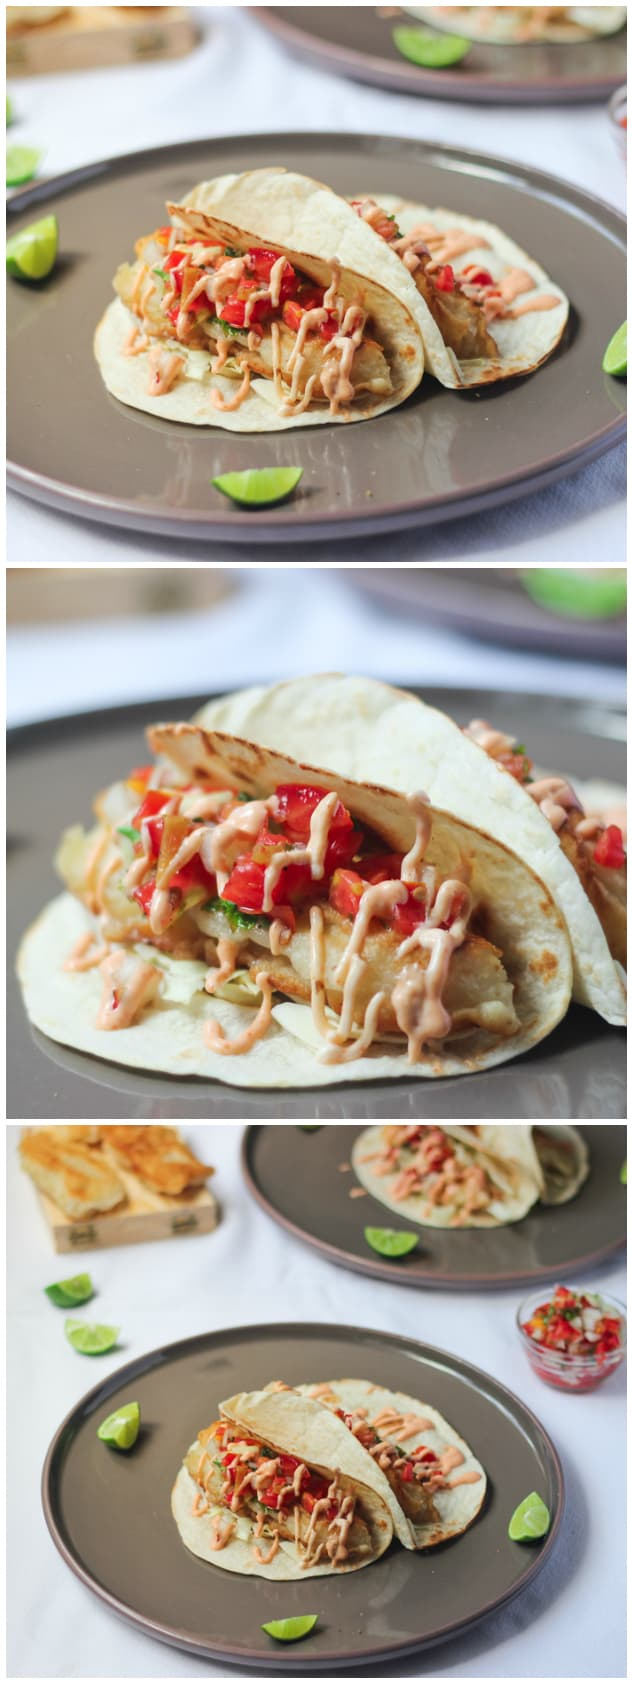 Side shot of tacos on grey plates.